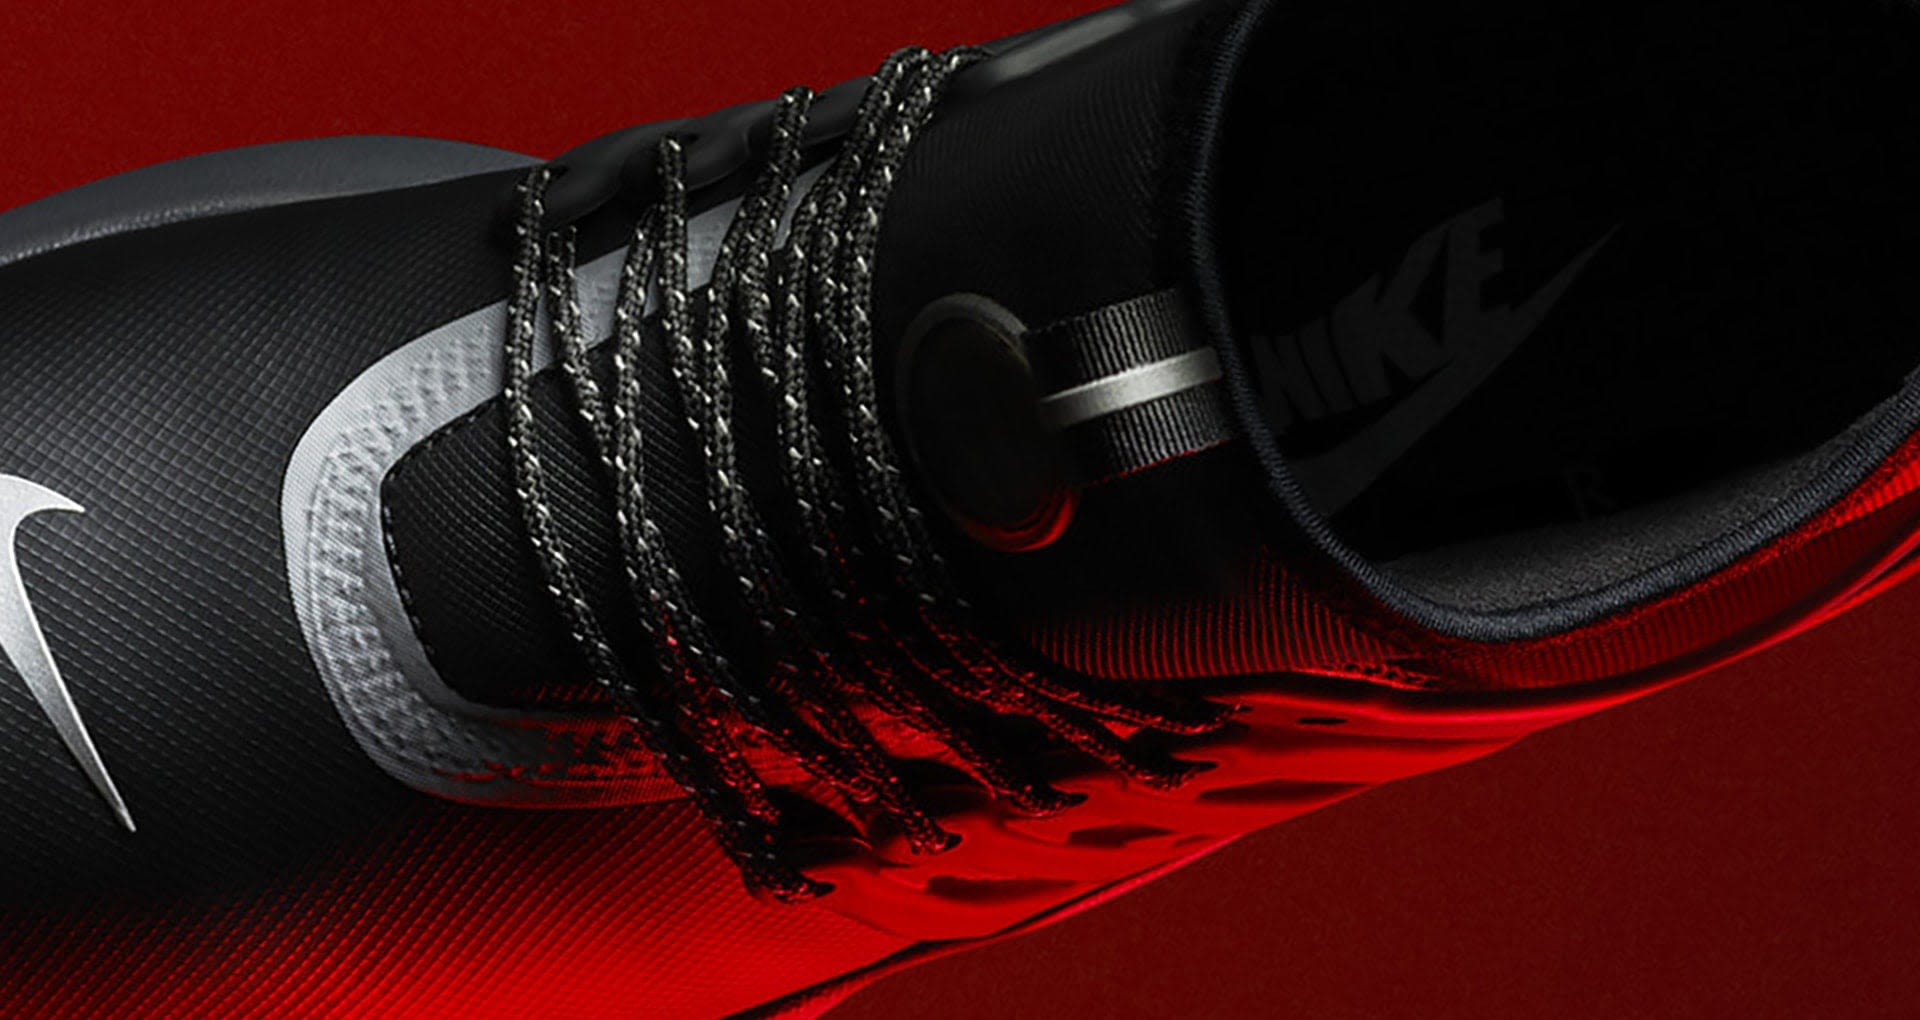 8fe53be55dea Dámská bota Nike Air Presto Mid Utility Sneakerboot  Black  amp  Reflect  Silver .